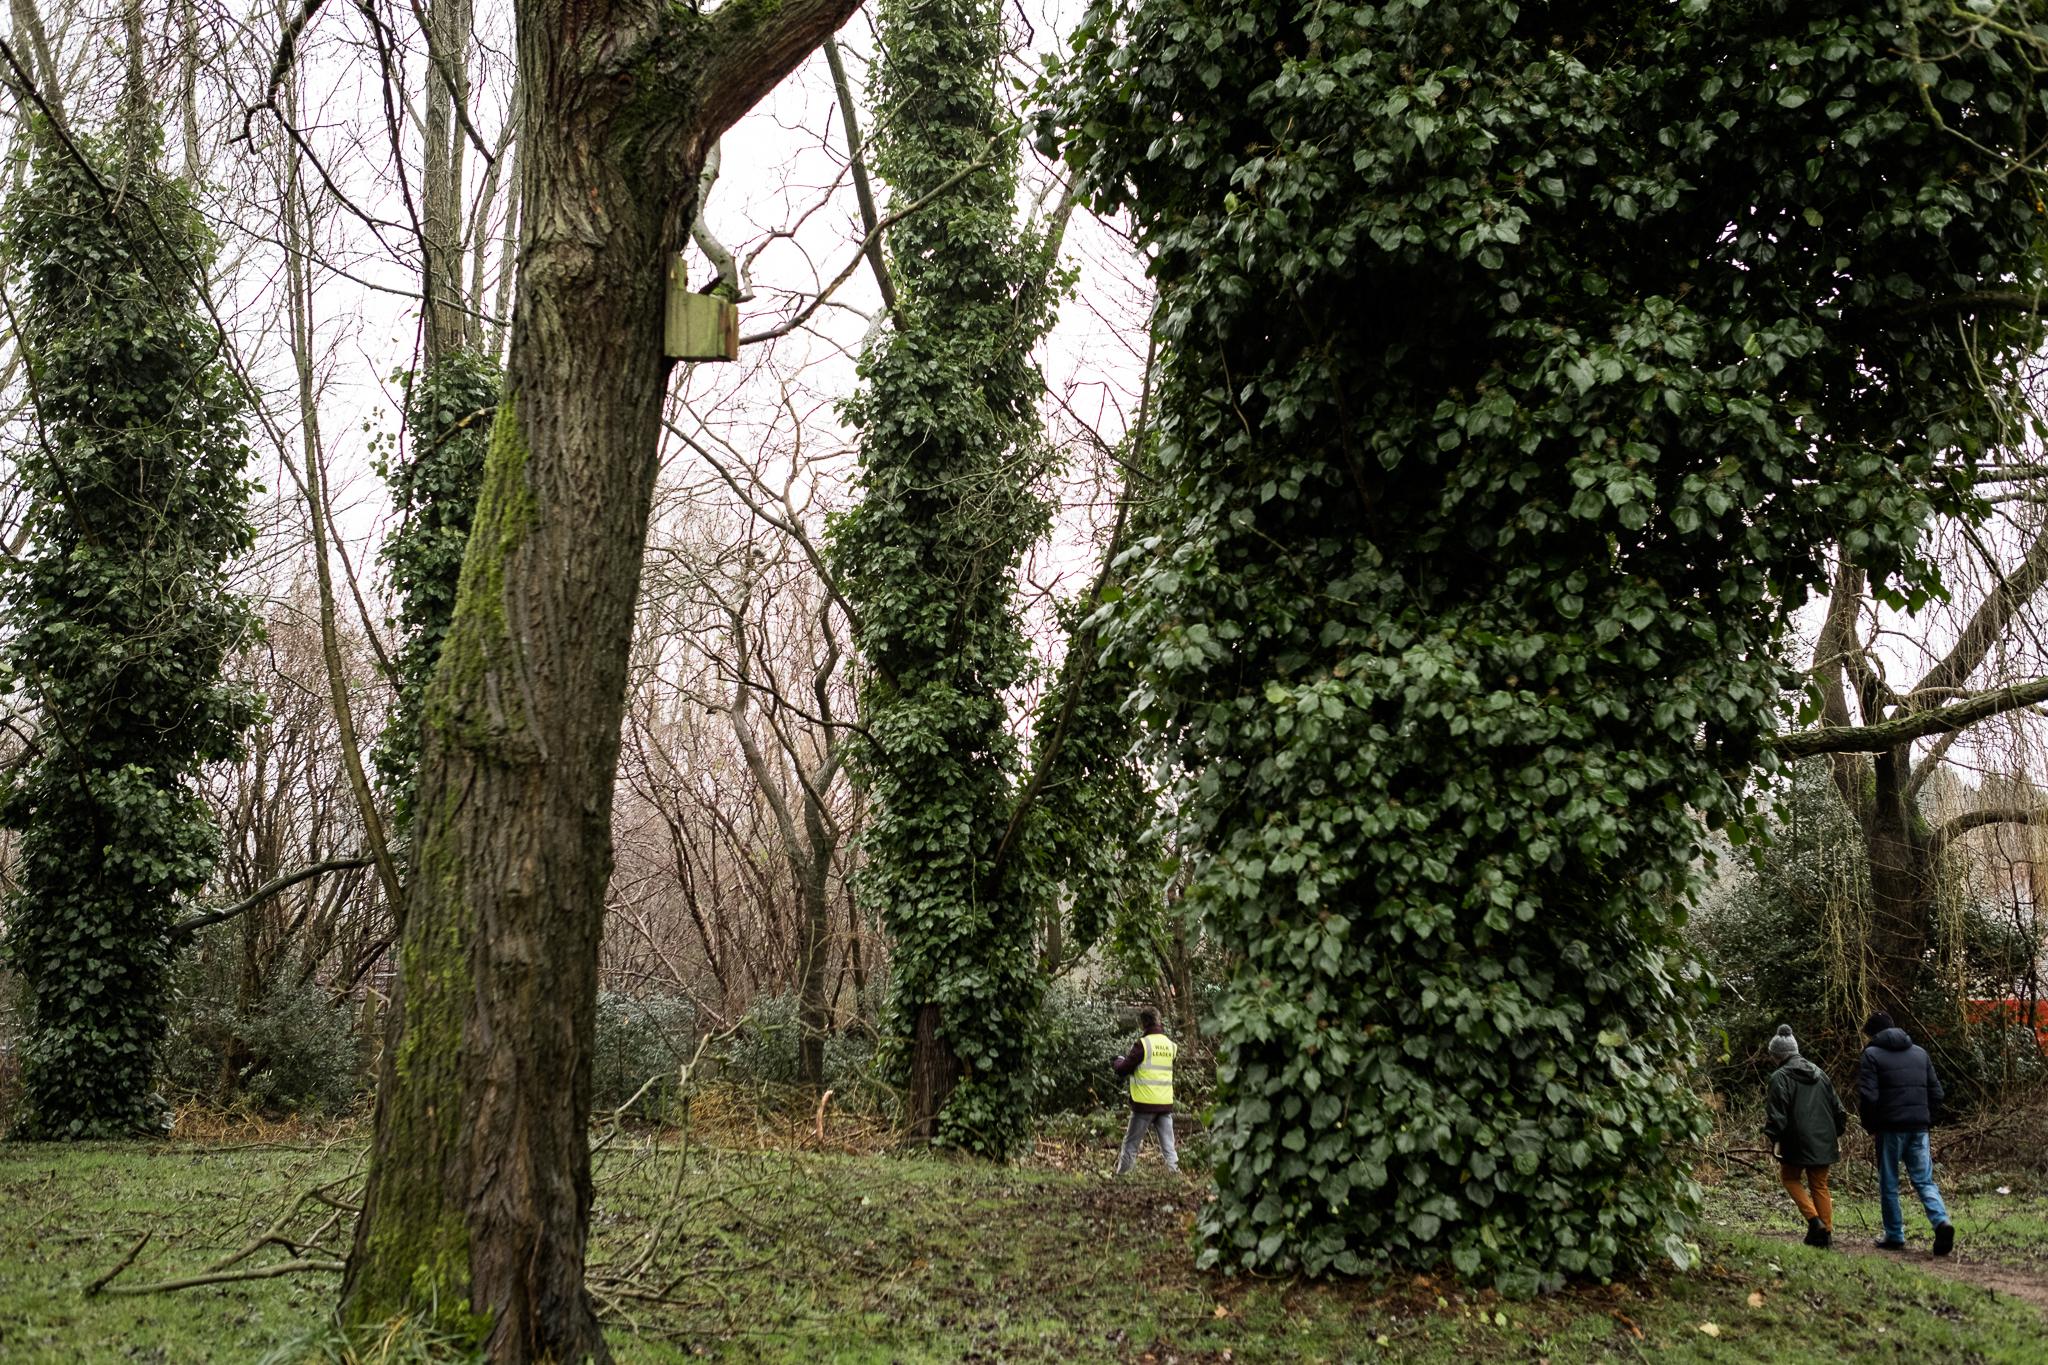 Closer to Home Walk Photowalk Joiner's Square, Hanley, Stoke-on-Trent, Staffordshire Winter Nature Reserve-3.jpg